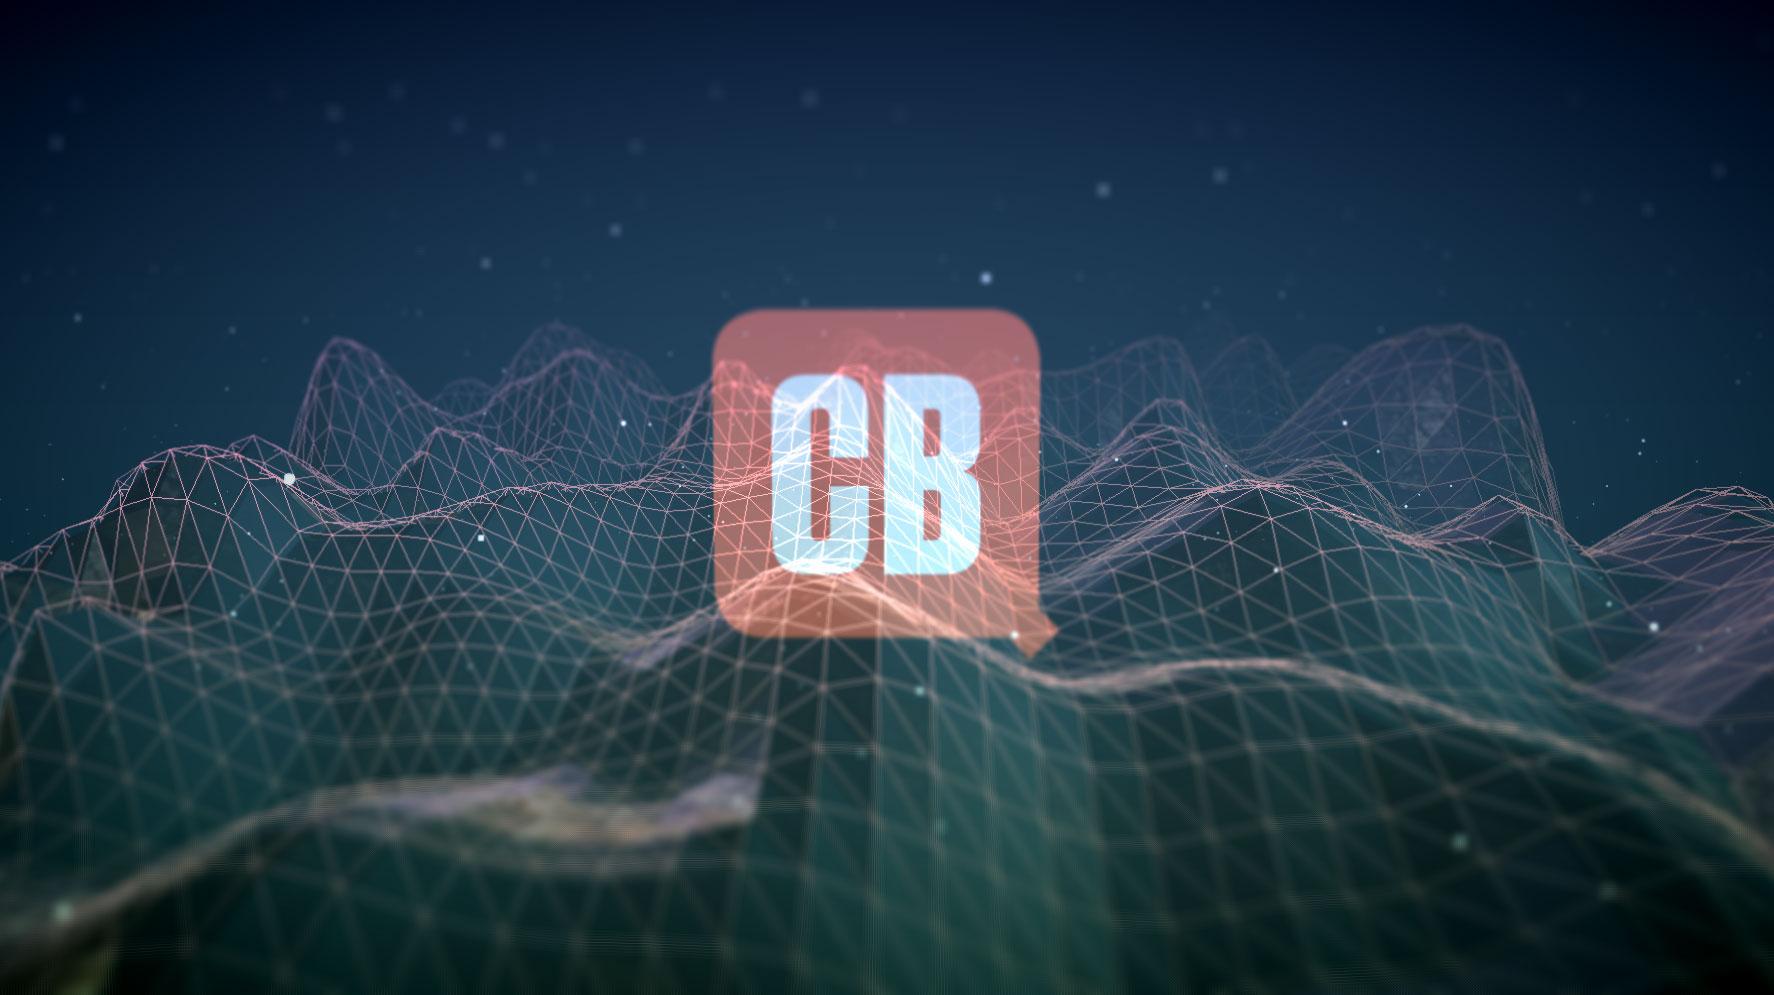 Create liquid effects with WebGL